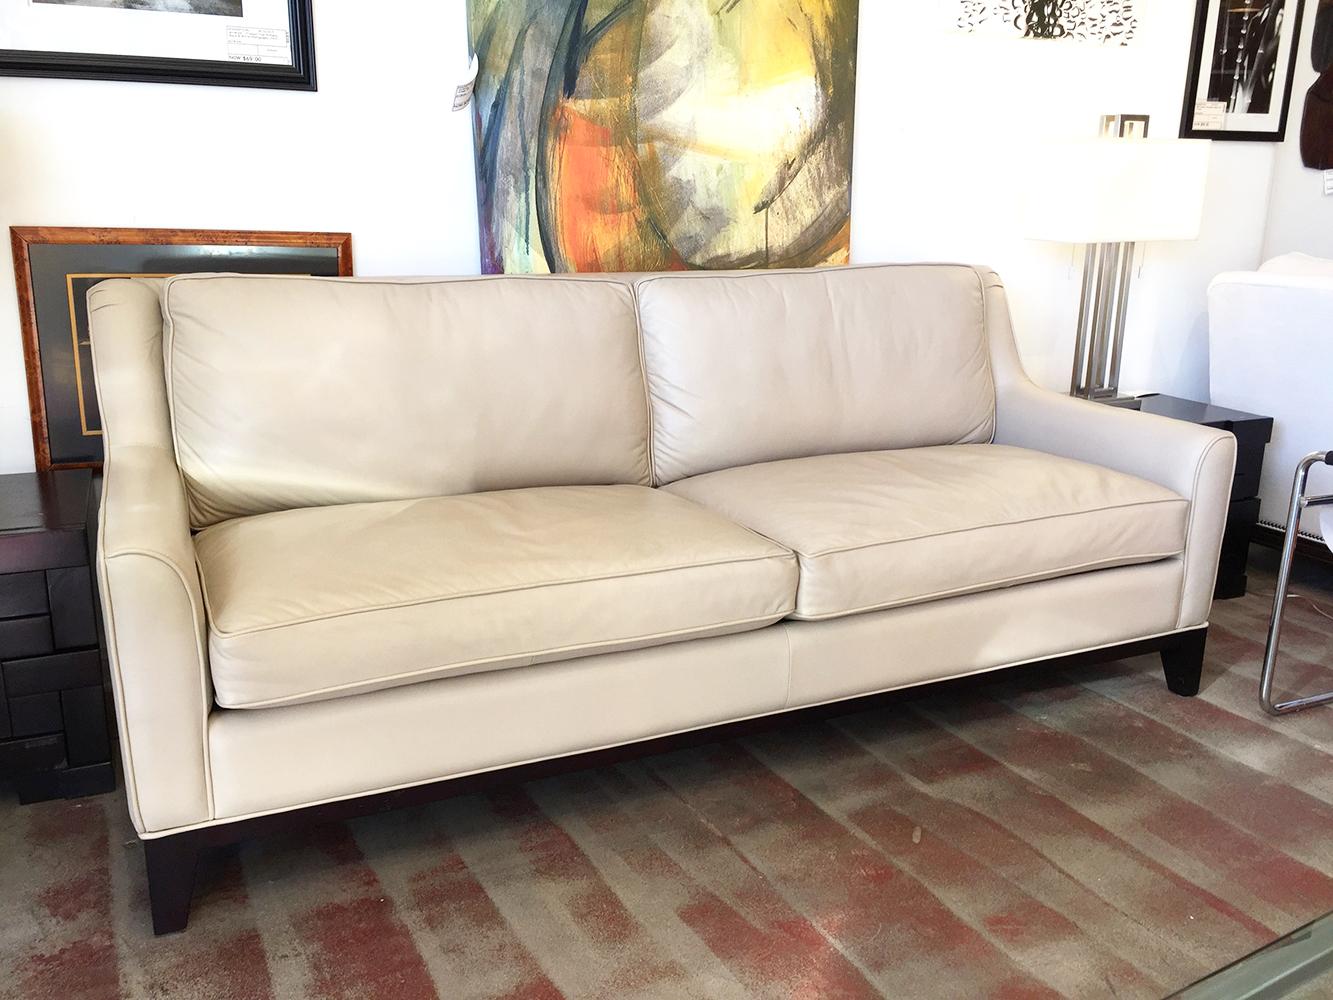 Italian Cream Leather Sofa | Chairish | Dream House | Pinterest